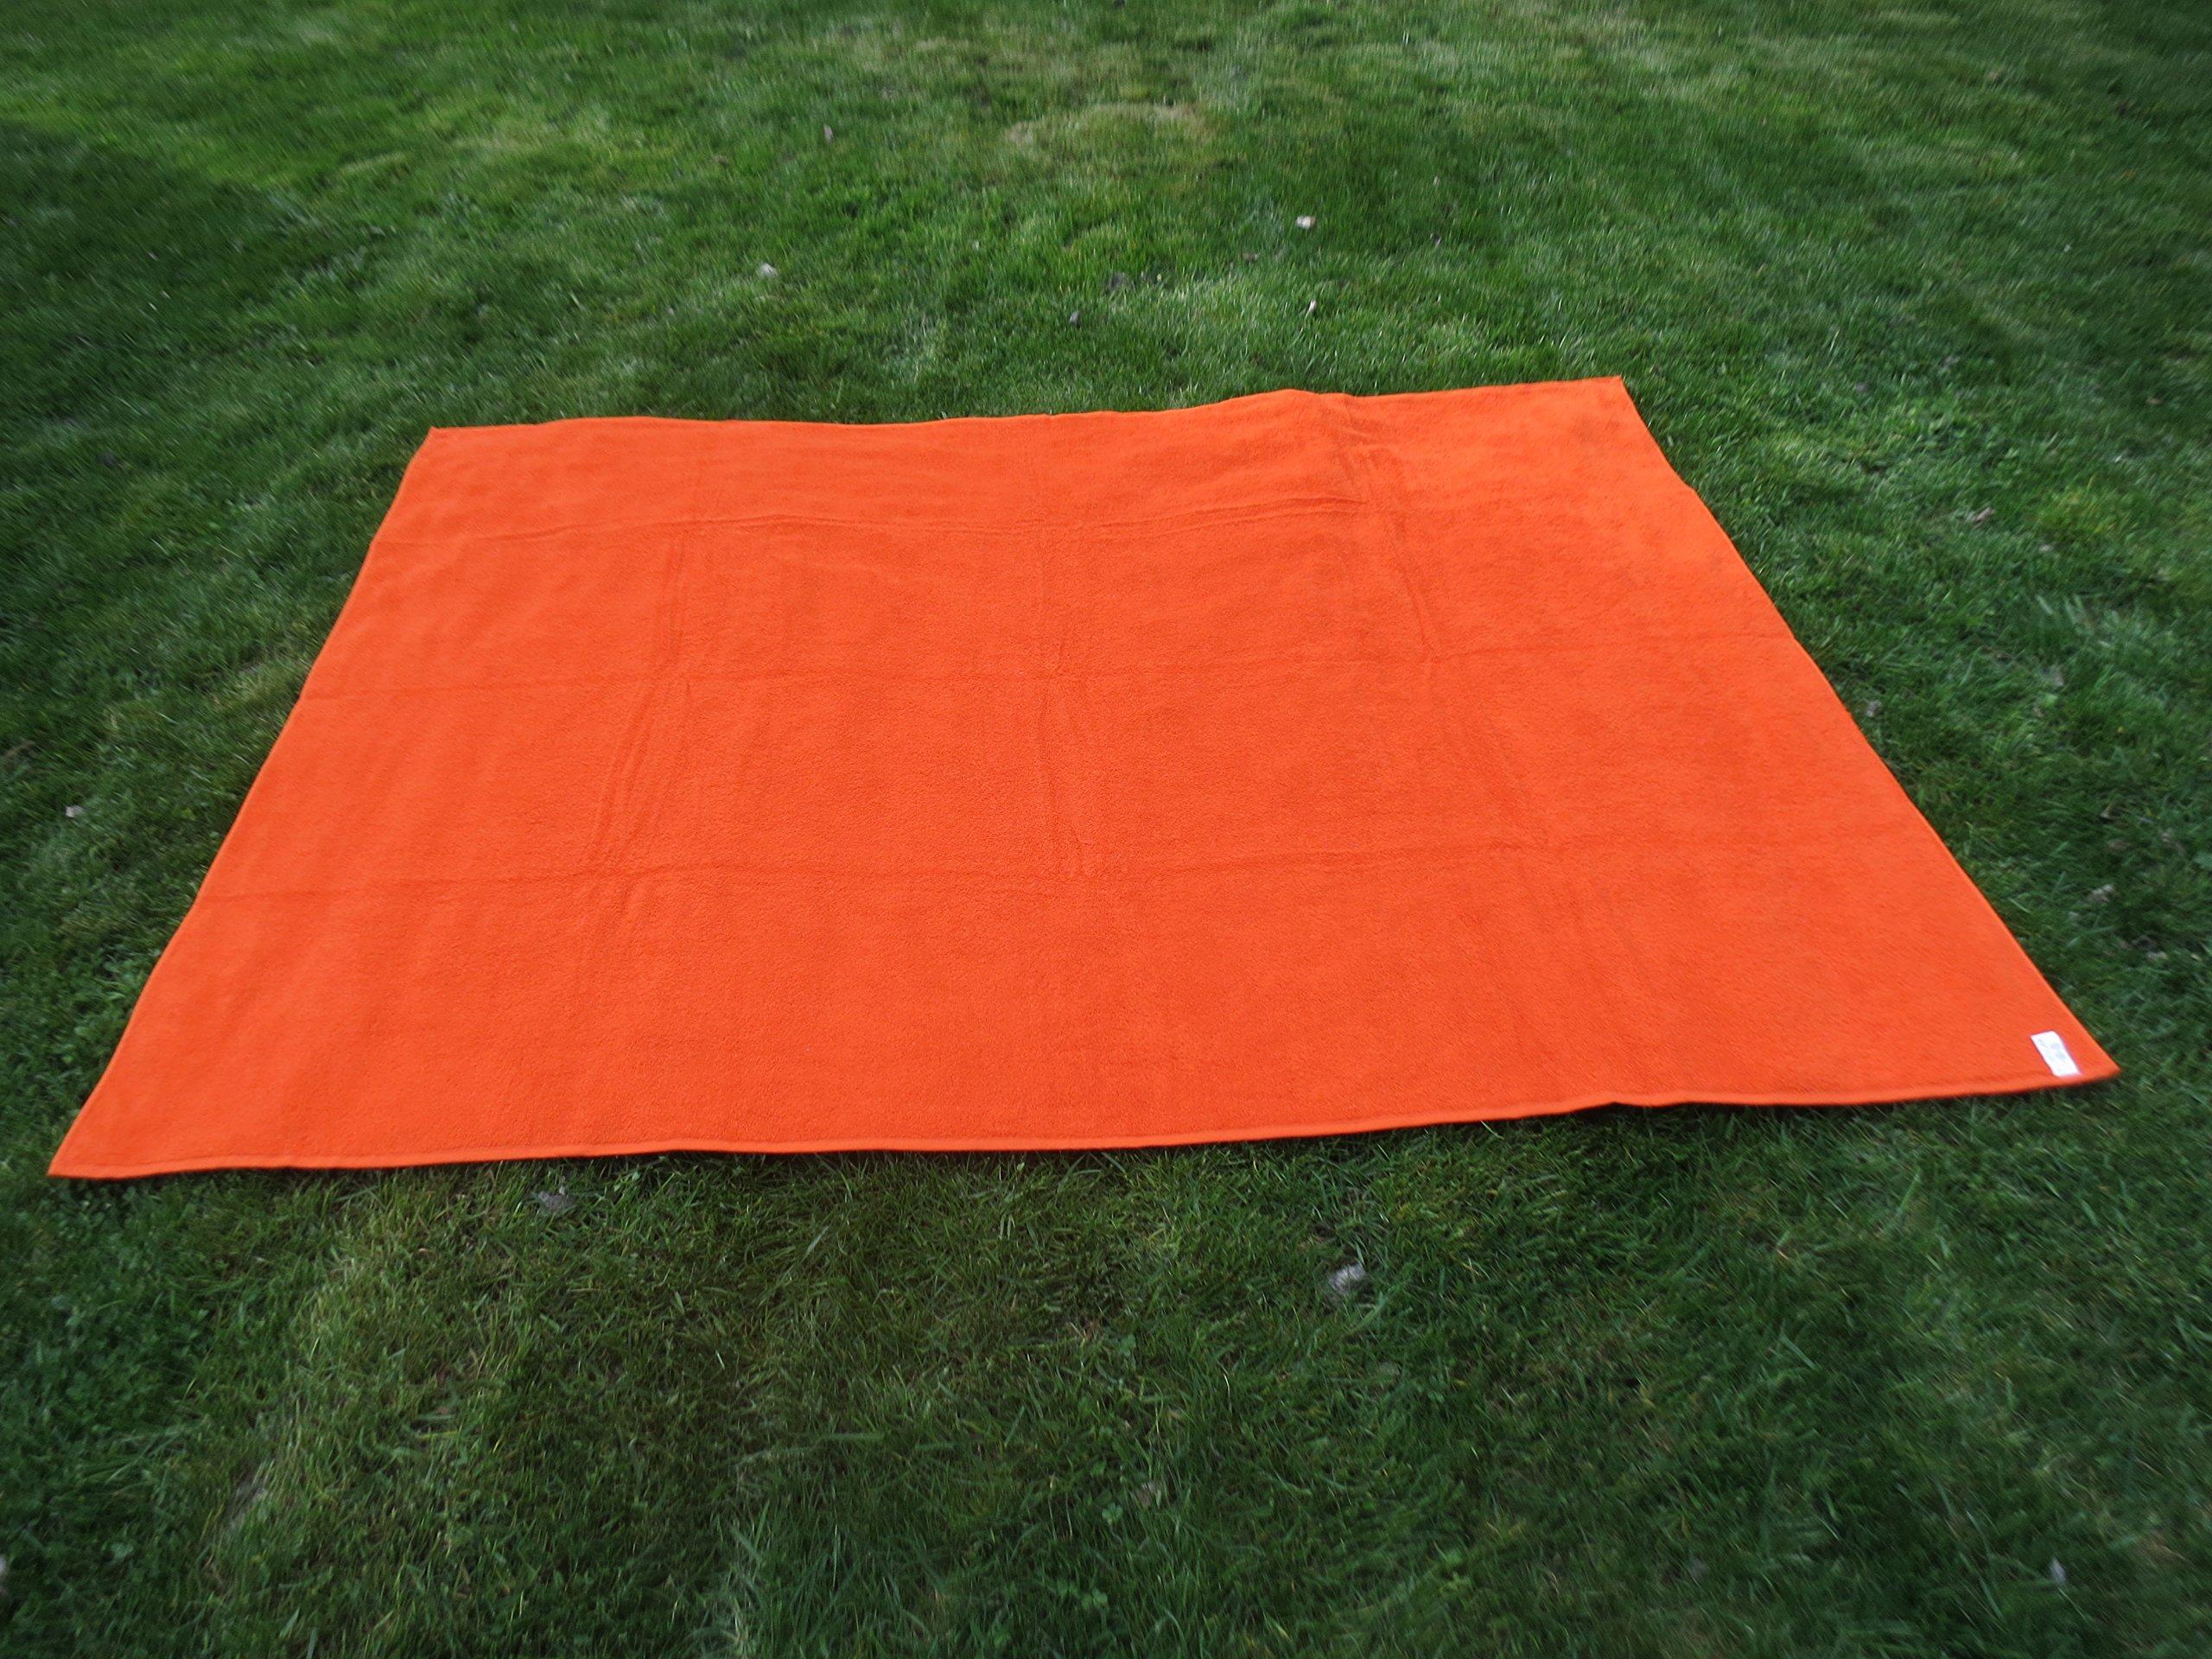 Toalla manta NARANJA 150x200cm , 100%algodón, 460gr/m2, fabricada en Portugal. product image